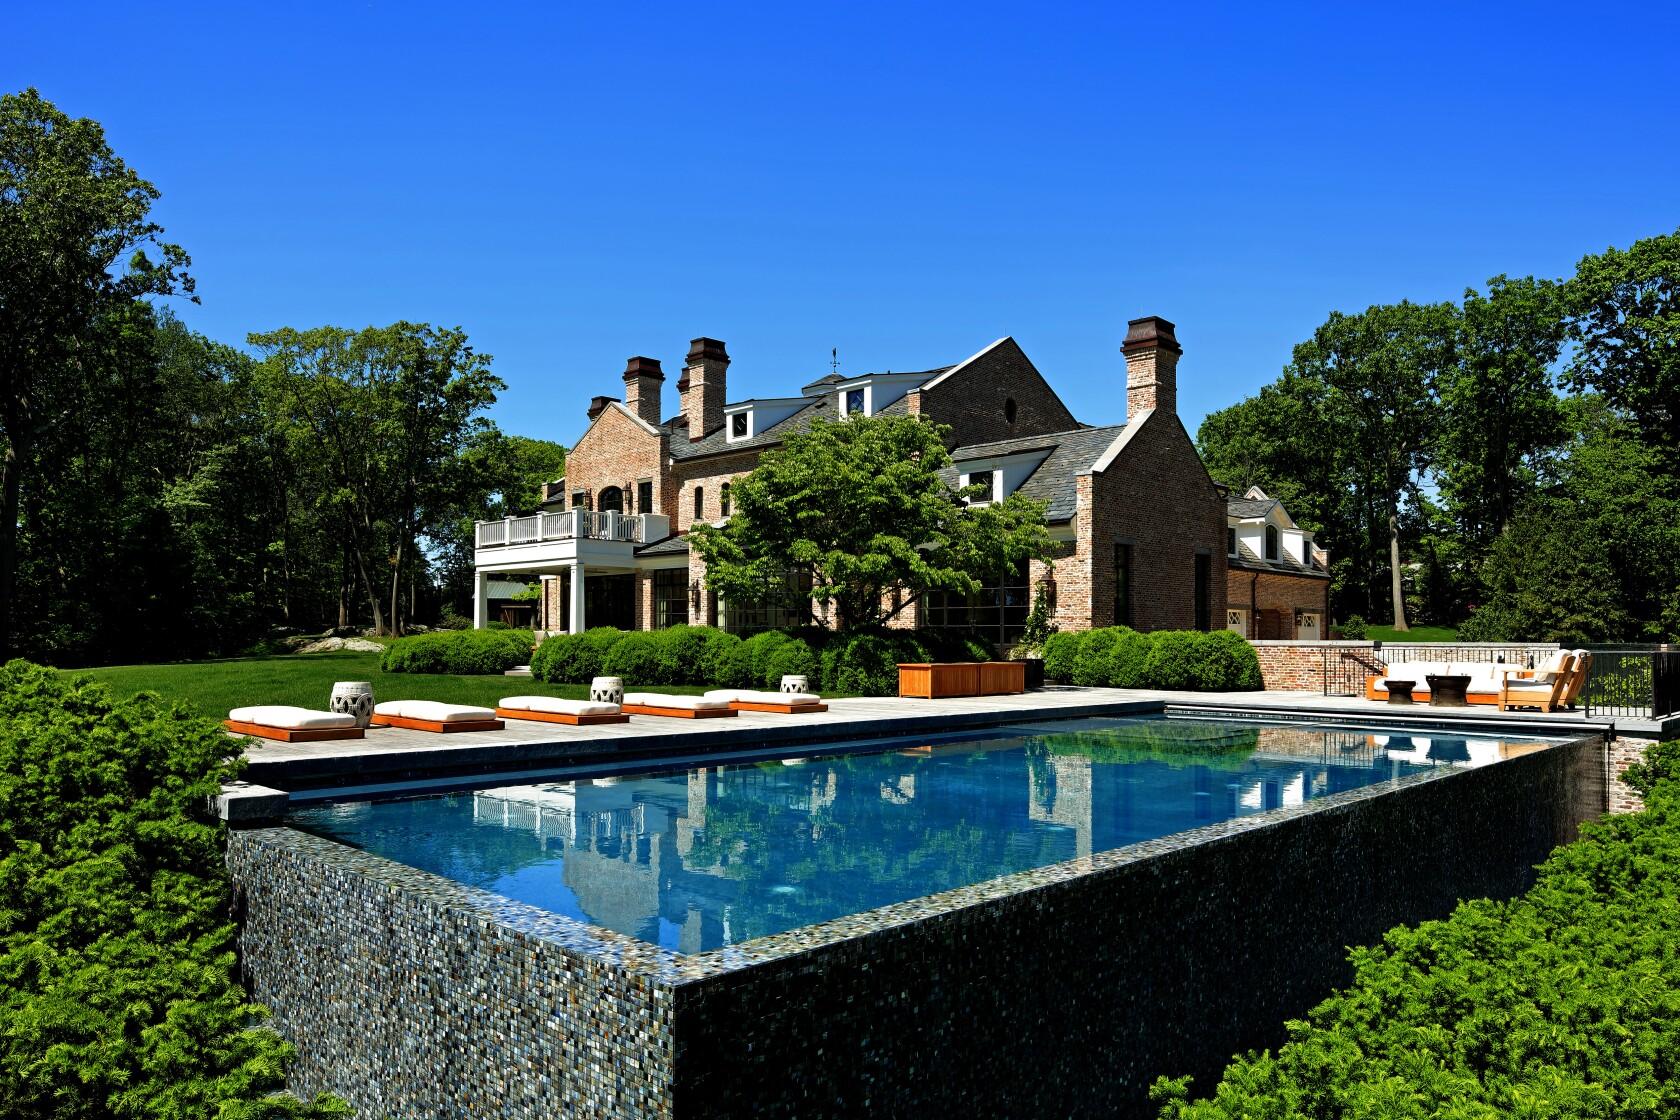 Hot Property: Tom Brady looks to score in the Massachusetts housing market